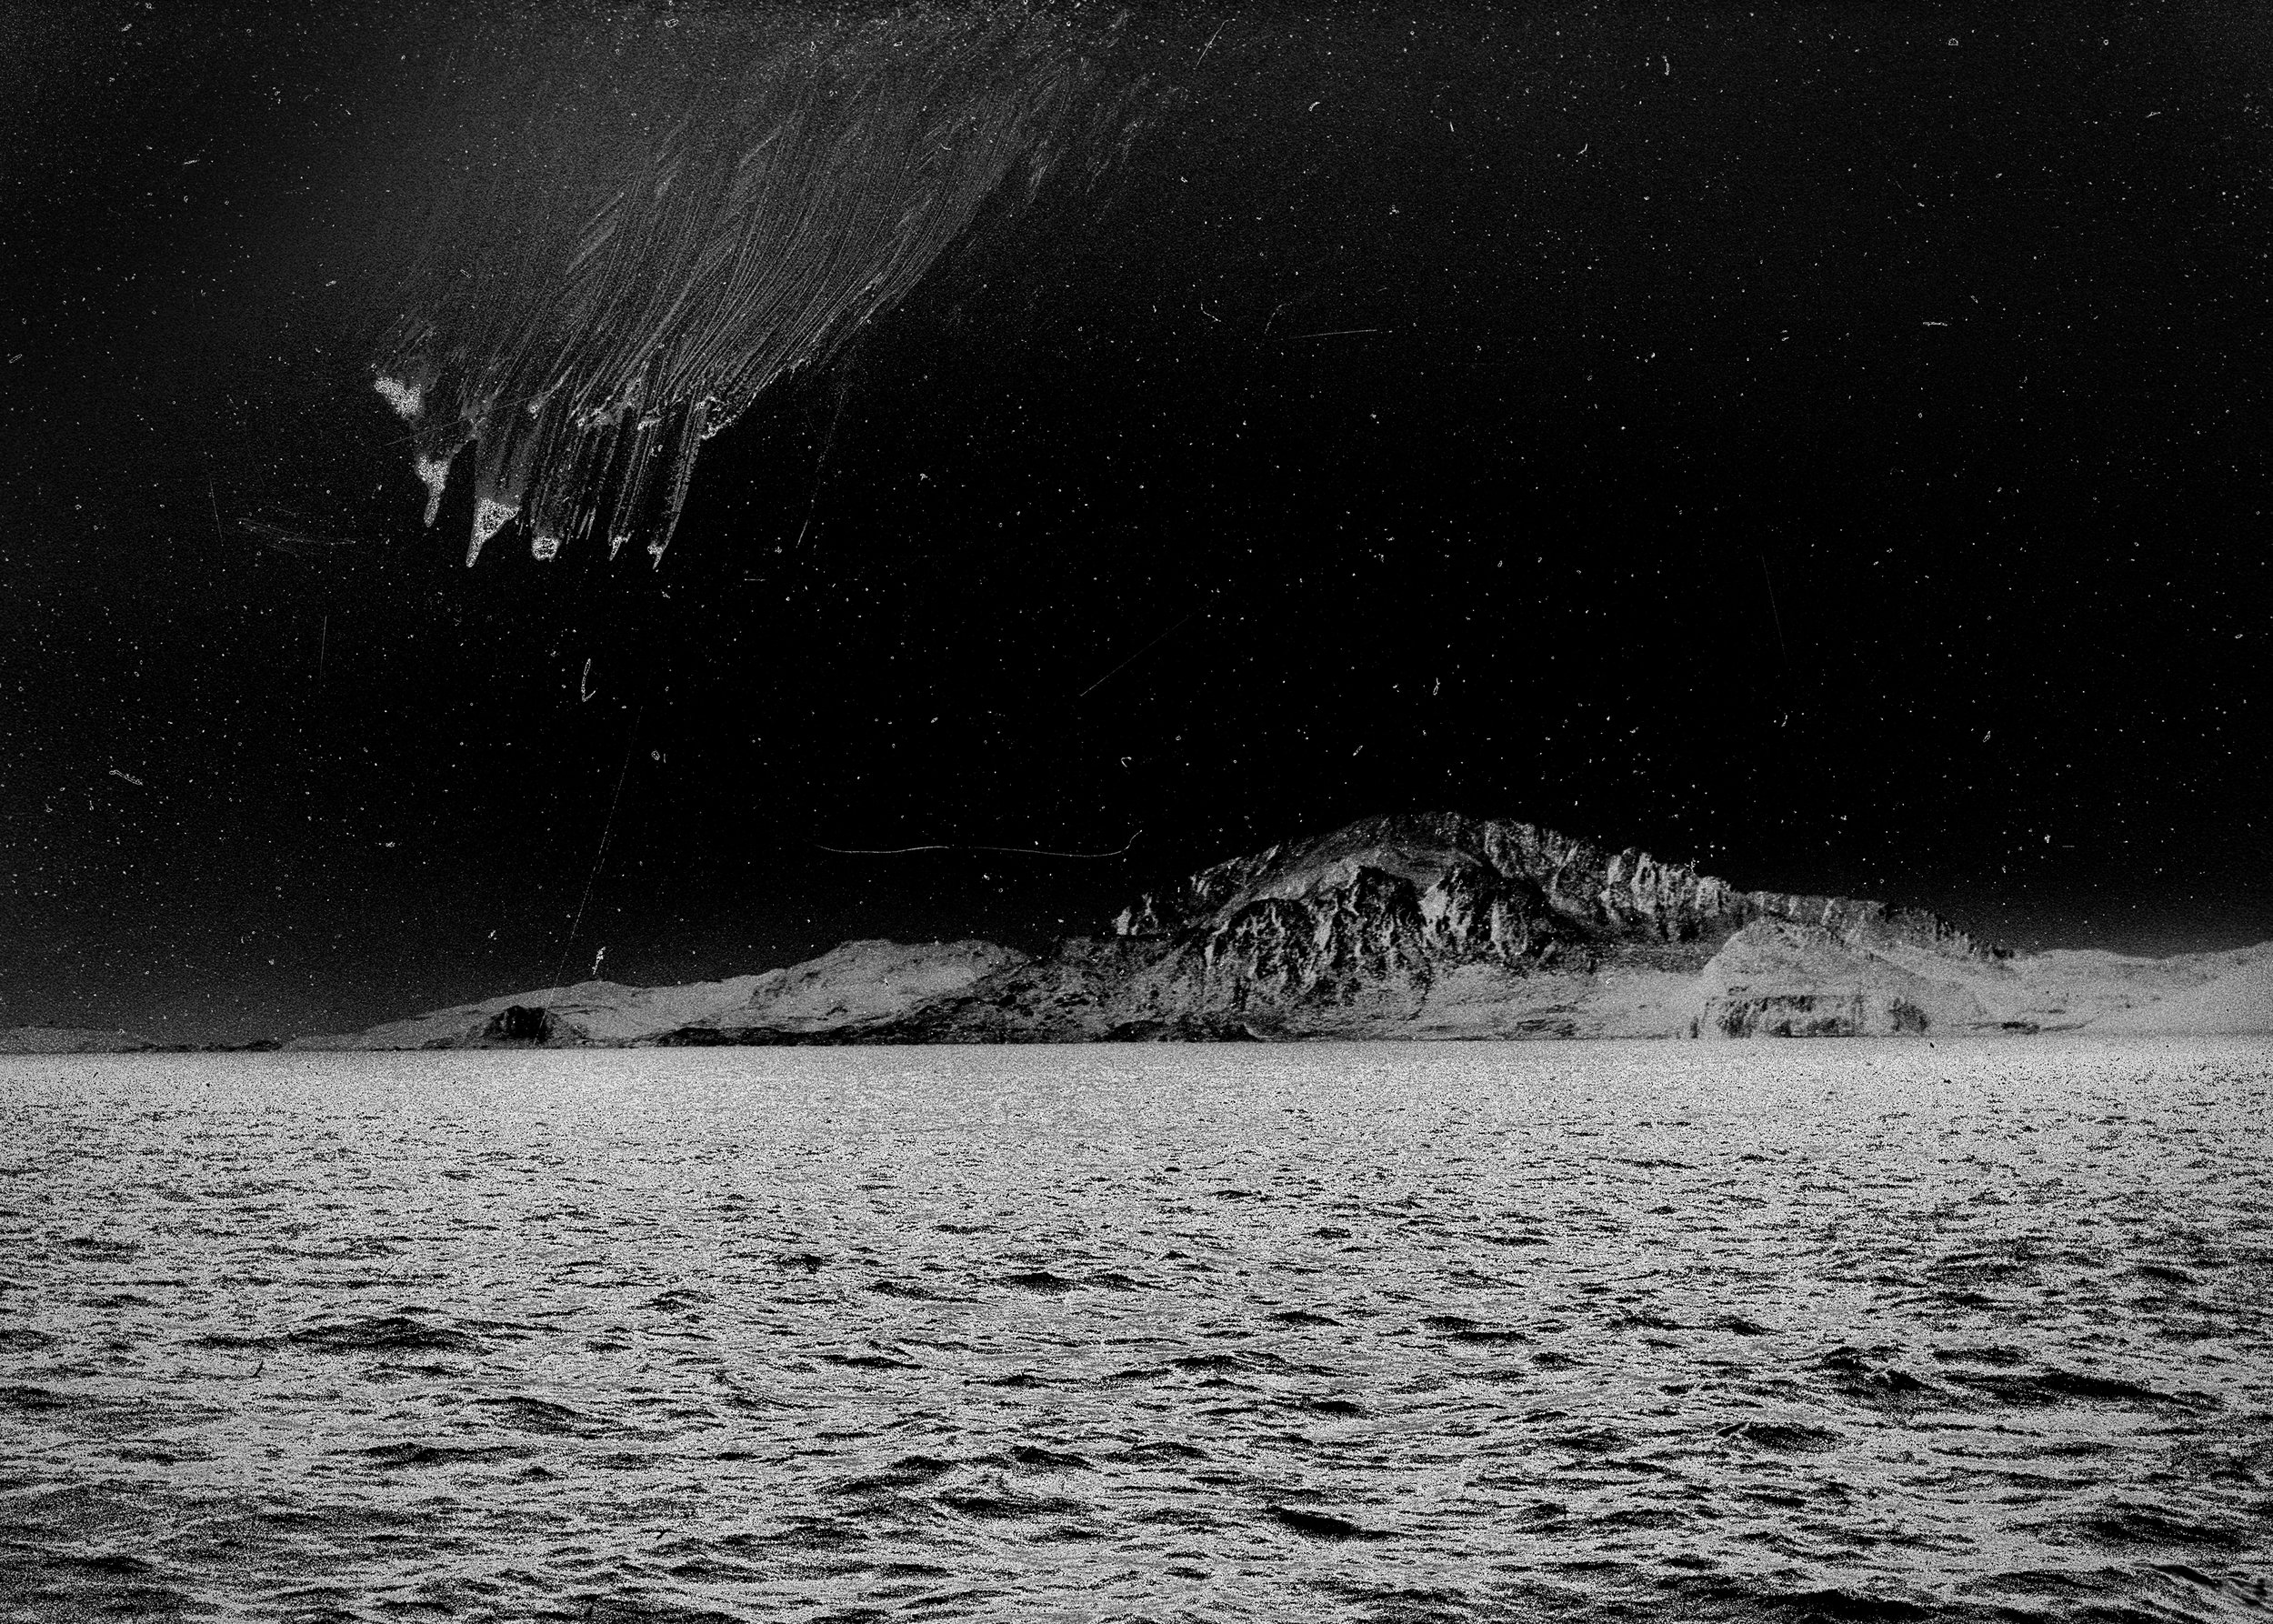 Stardust © Leif Sandberg